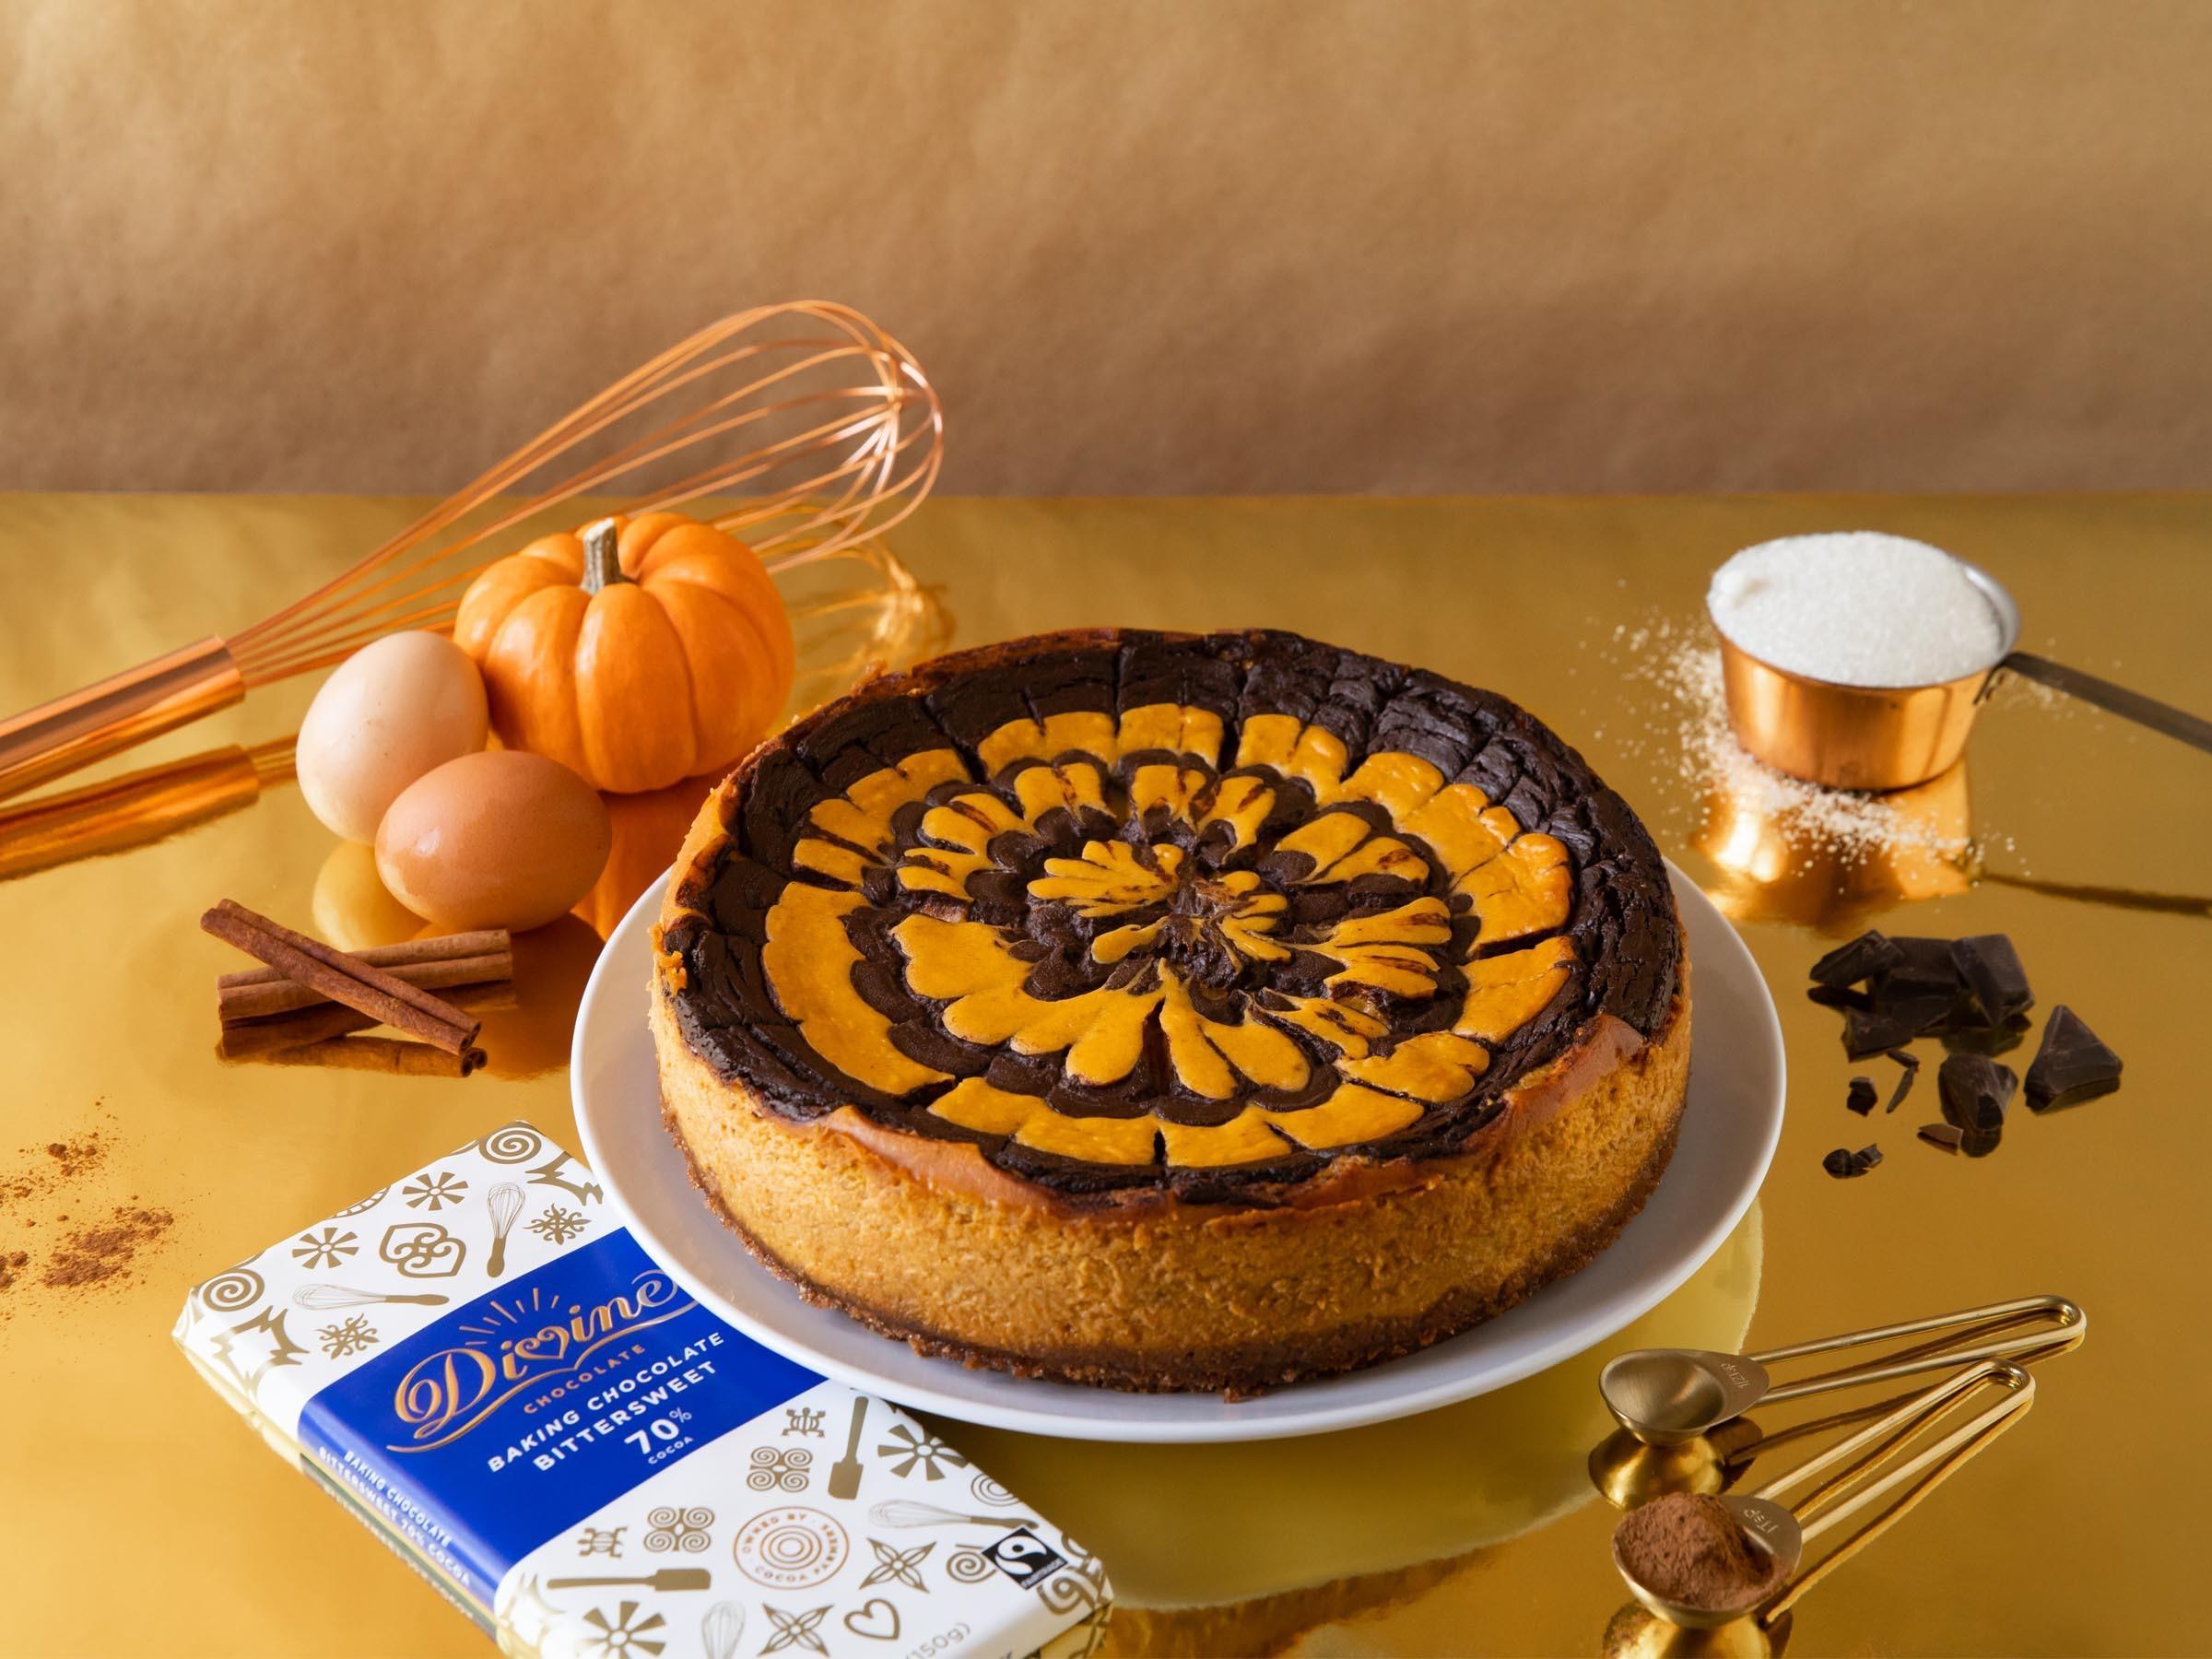 Pumpkin Cheesecake with Chocolate-Stout Ganache Swirl